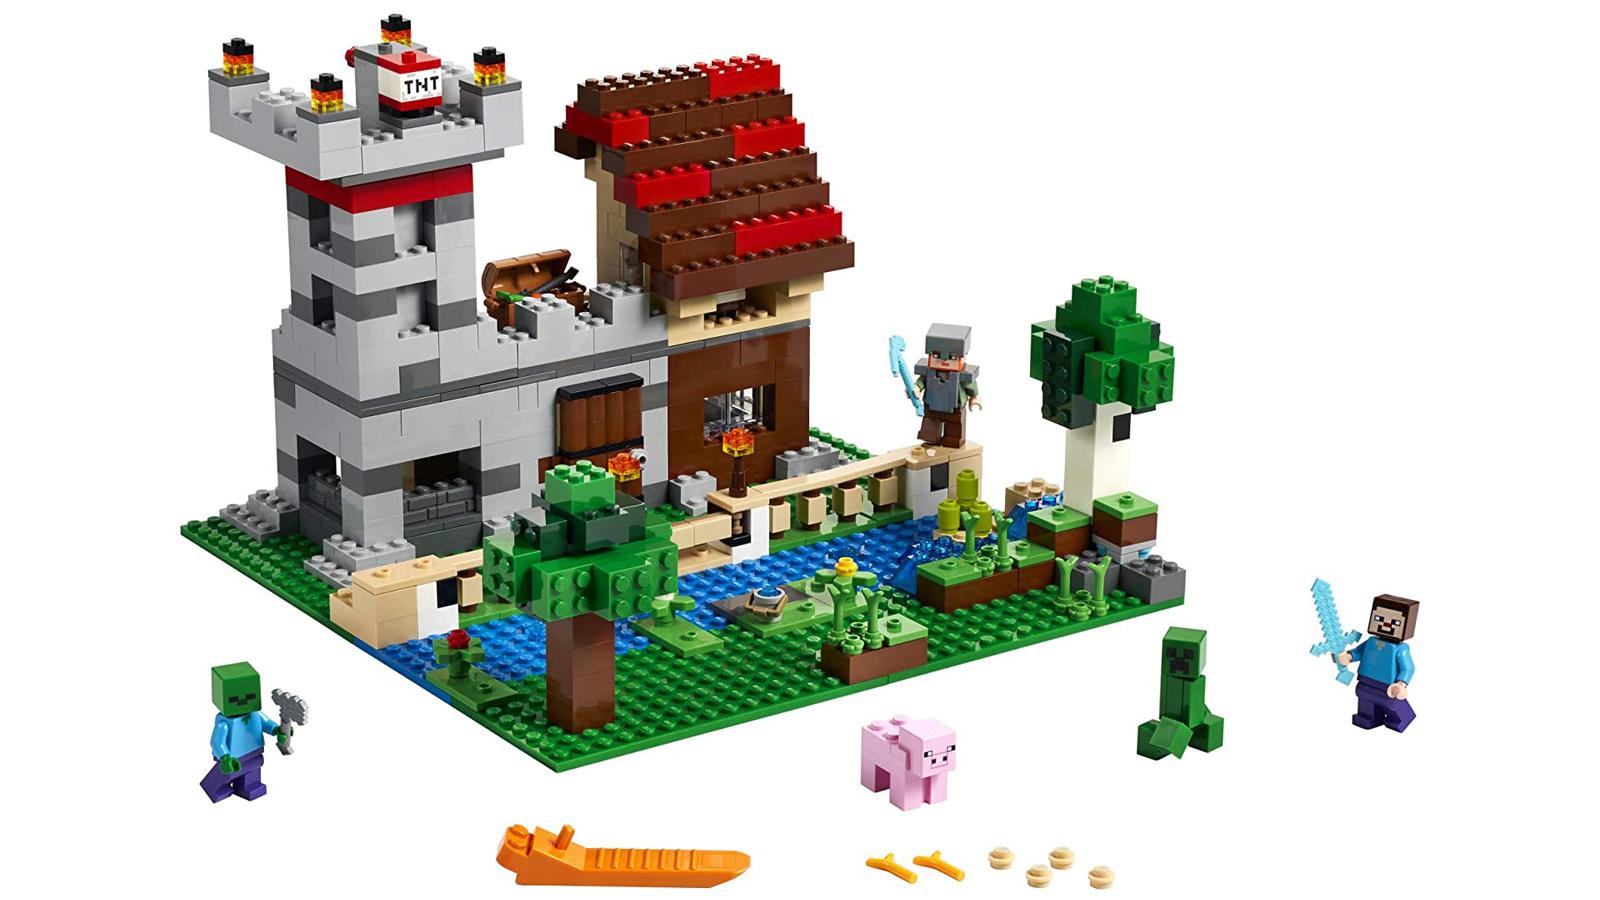 LEGO Minecraft The Crafting Box 3.0 Set